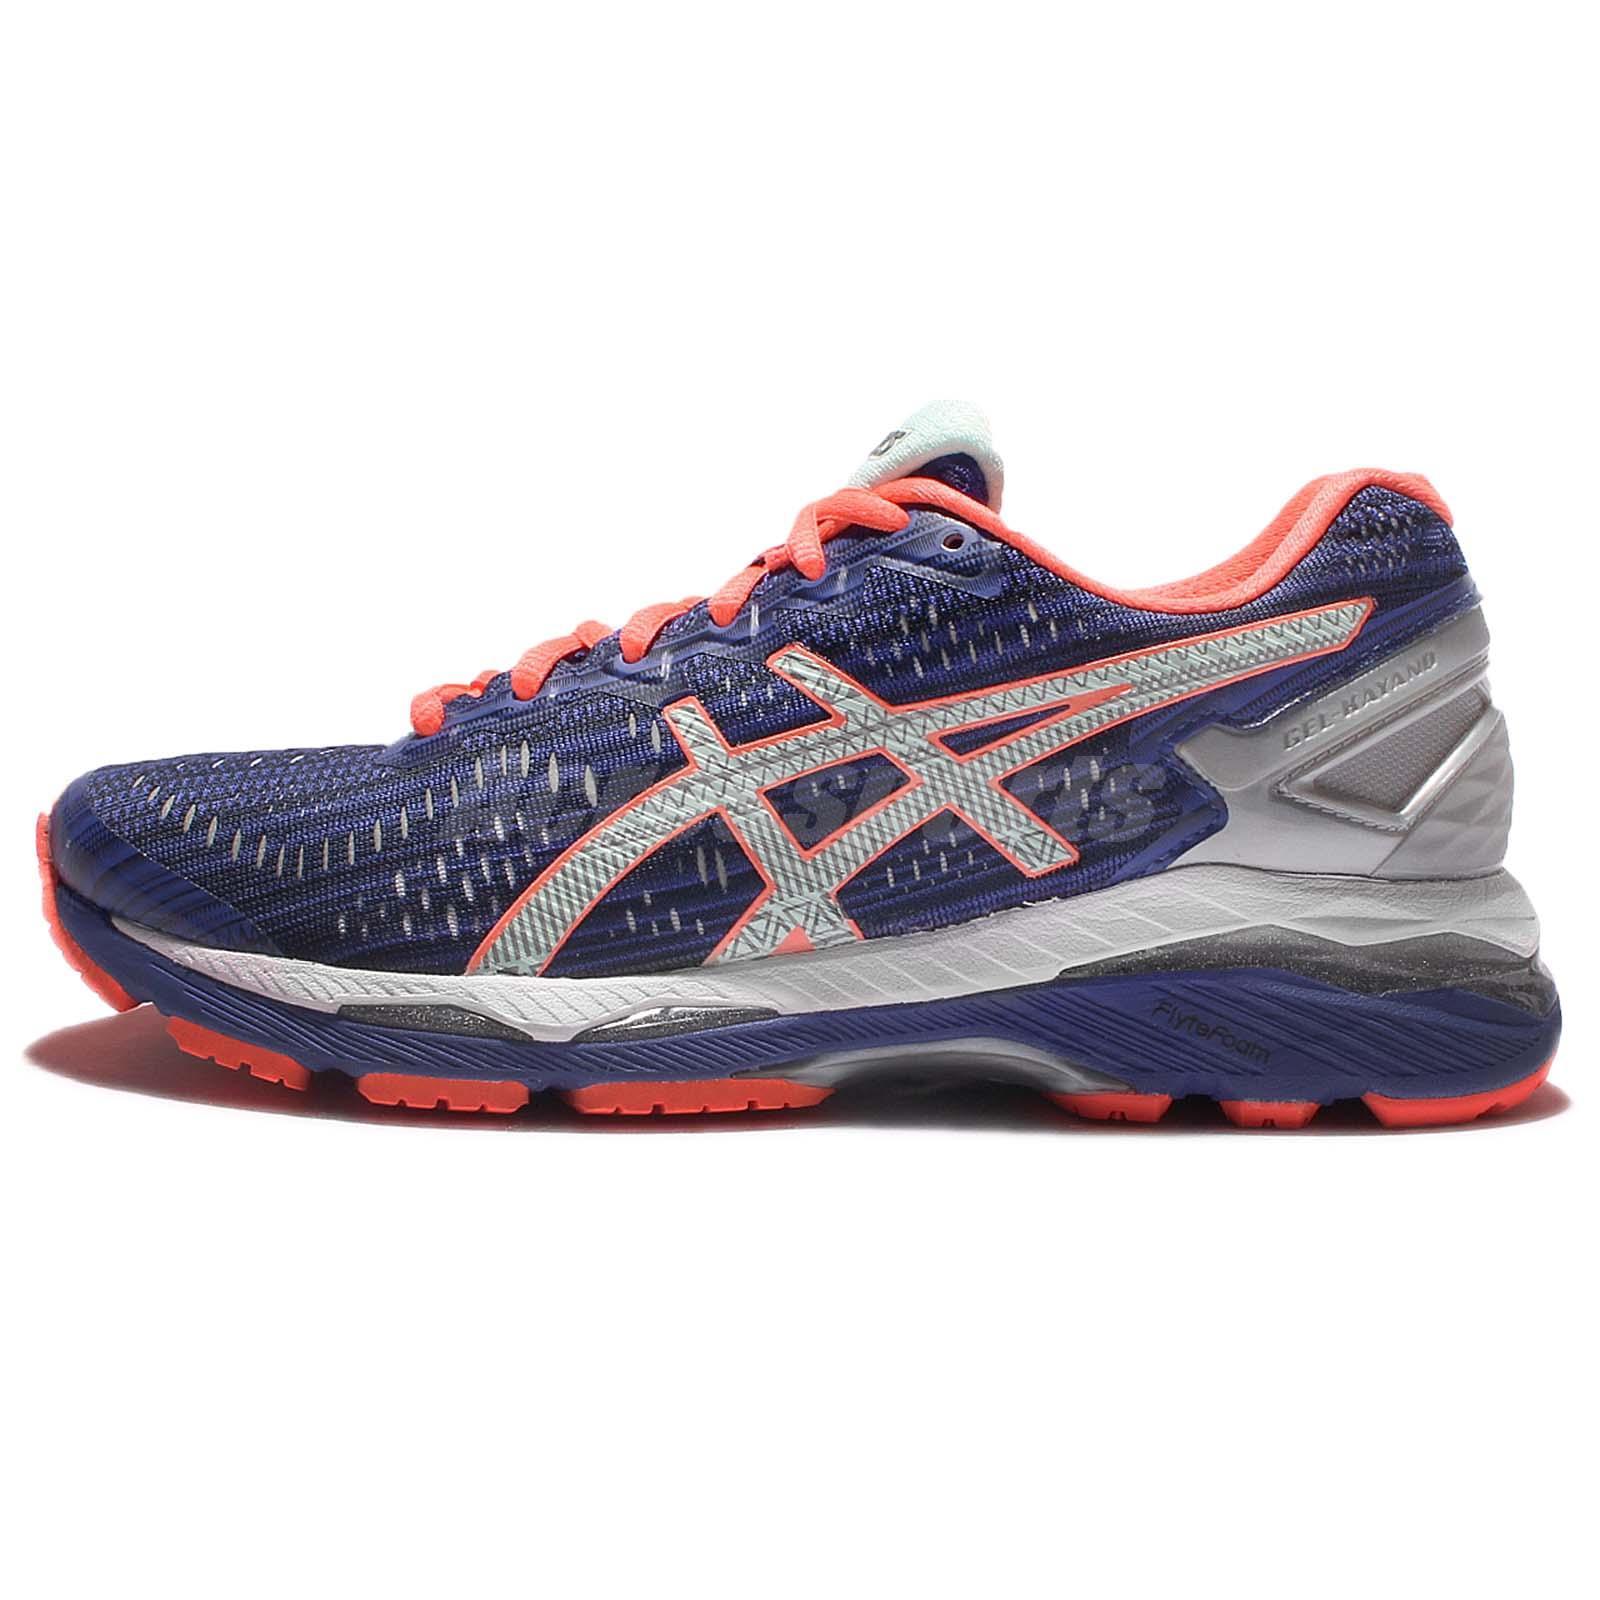 12bb67999286e Asics Gel-Kayano 23 Lite-Show Blue Orange Women Running Shoe Sneakers  T6A6N-4593